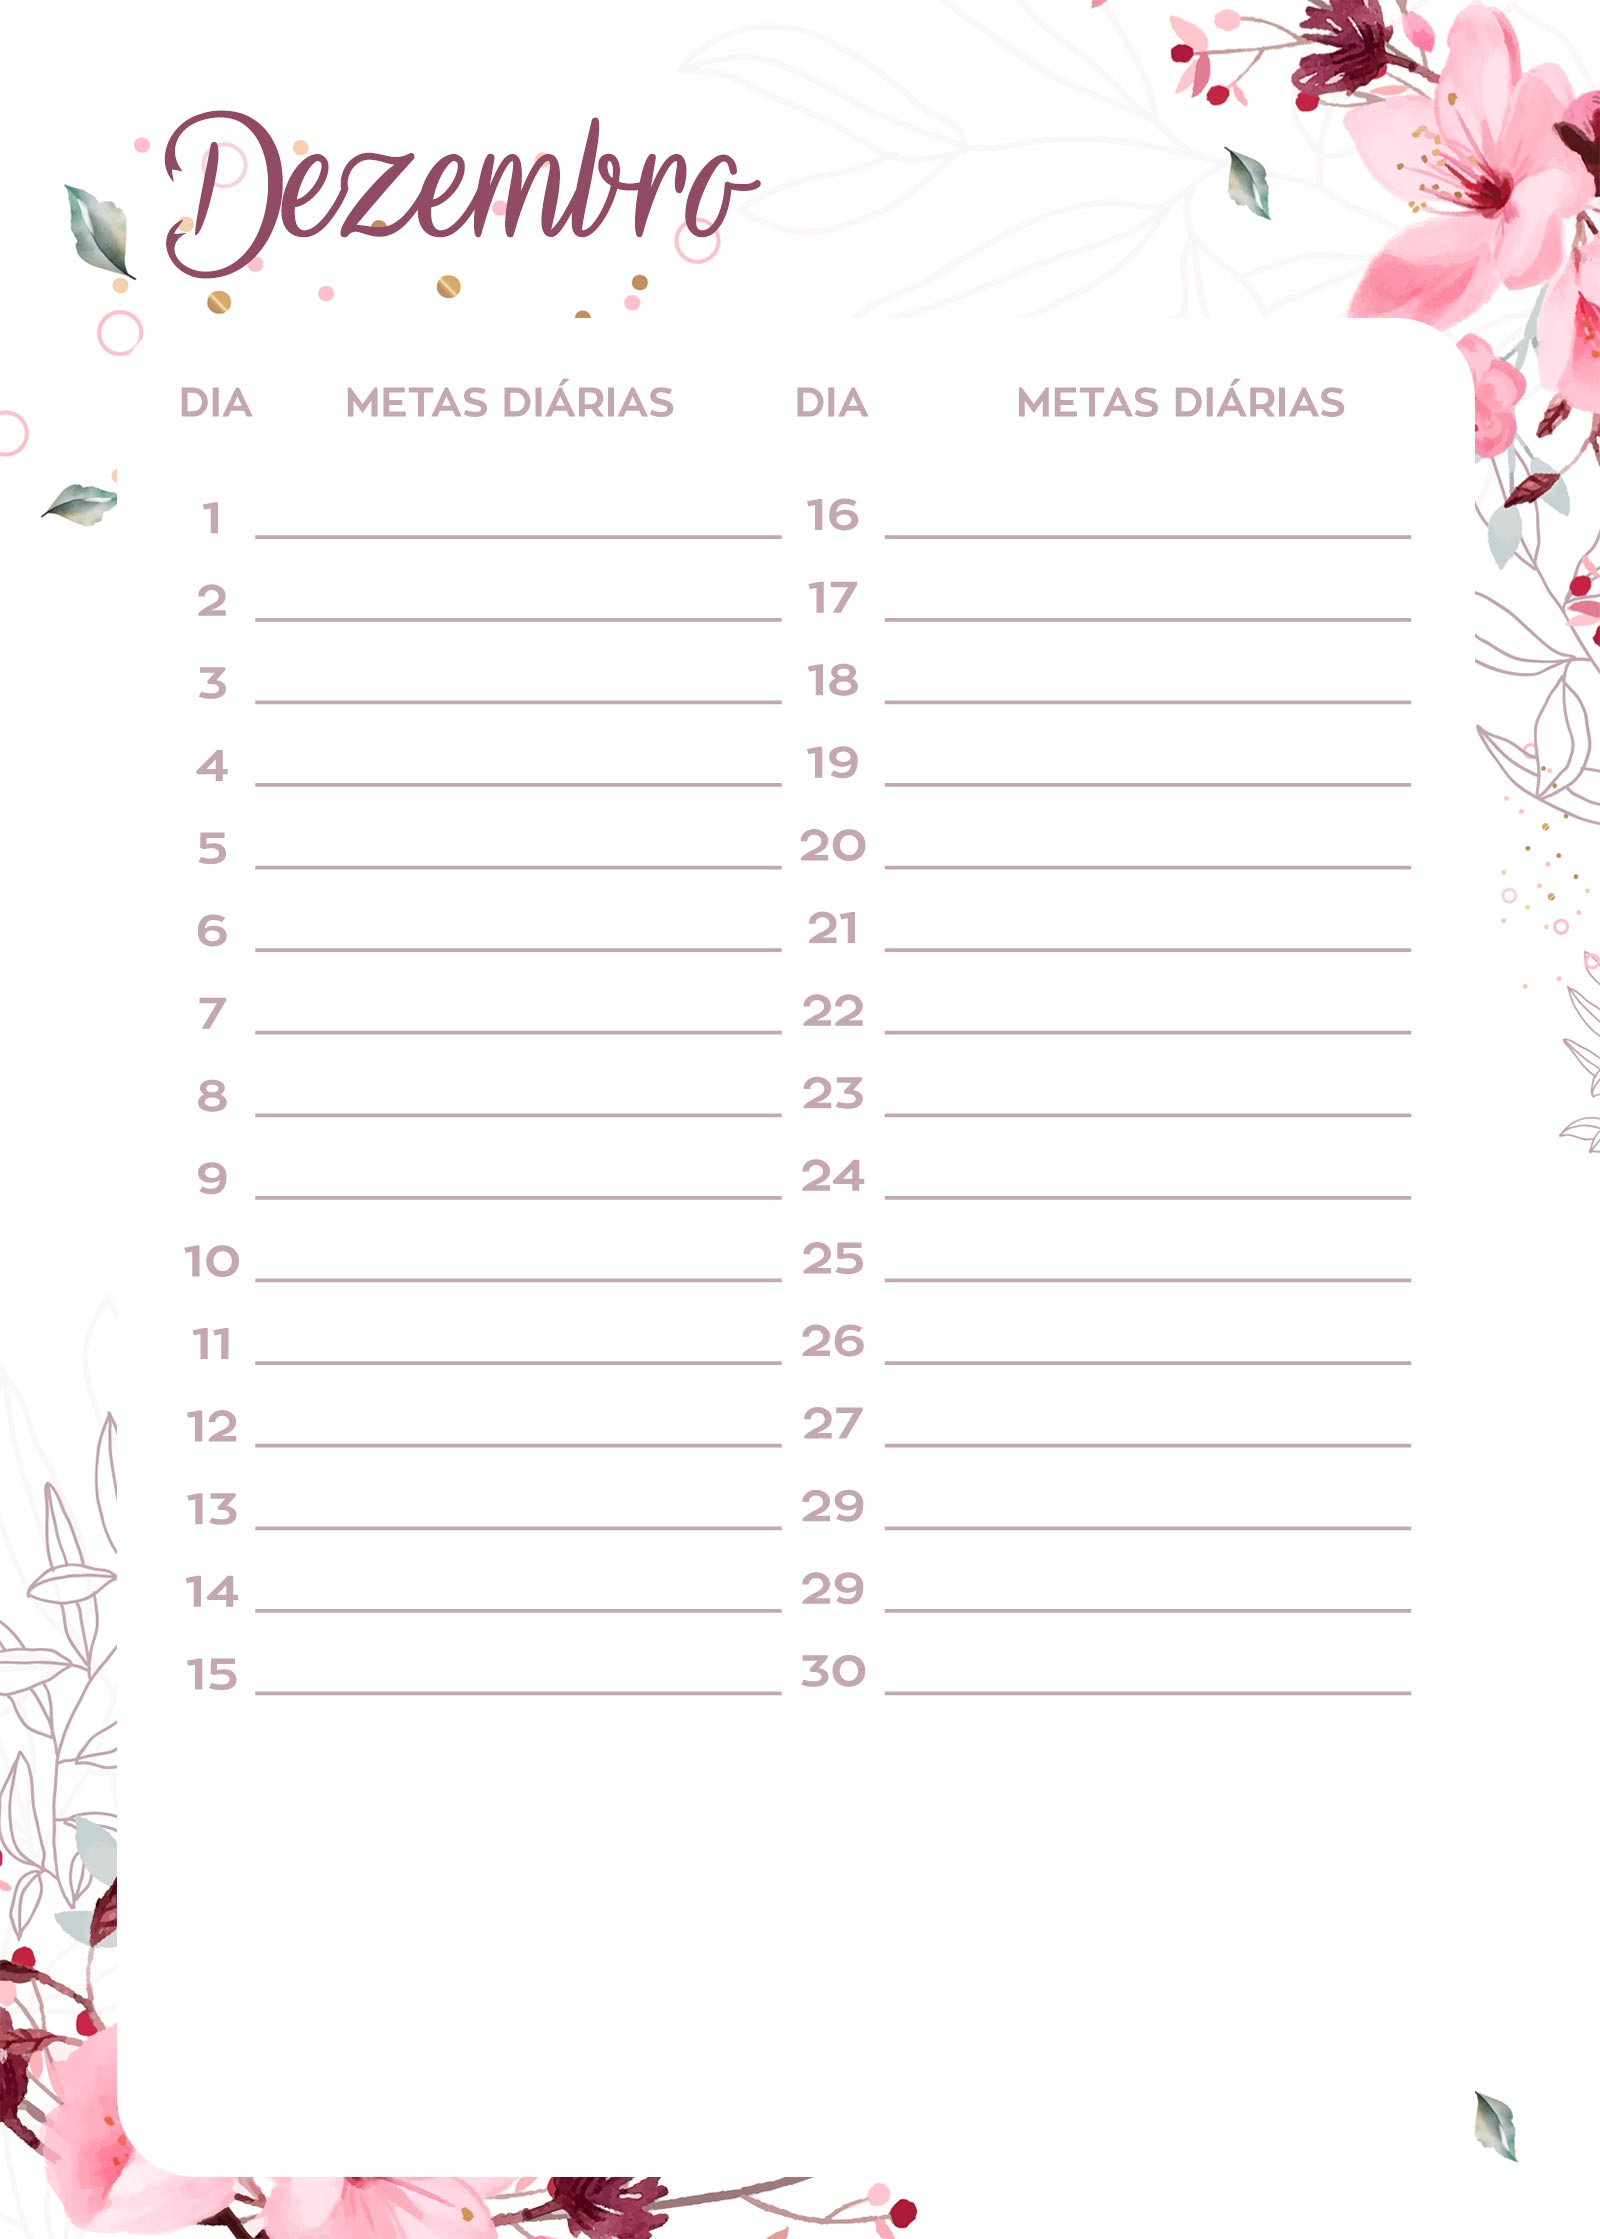 Planner Floral metas diarias dez